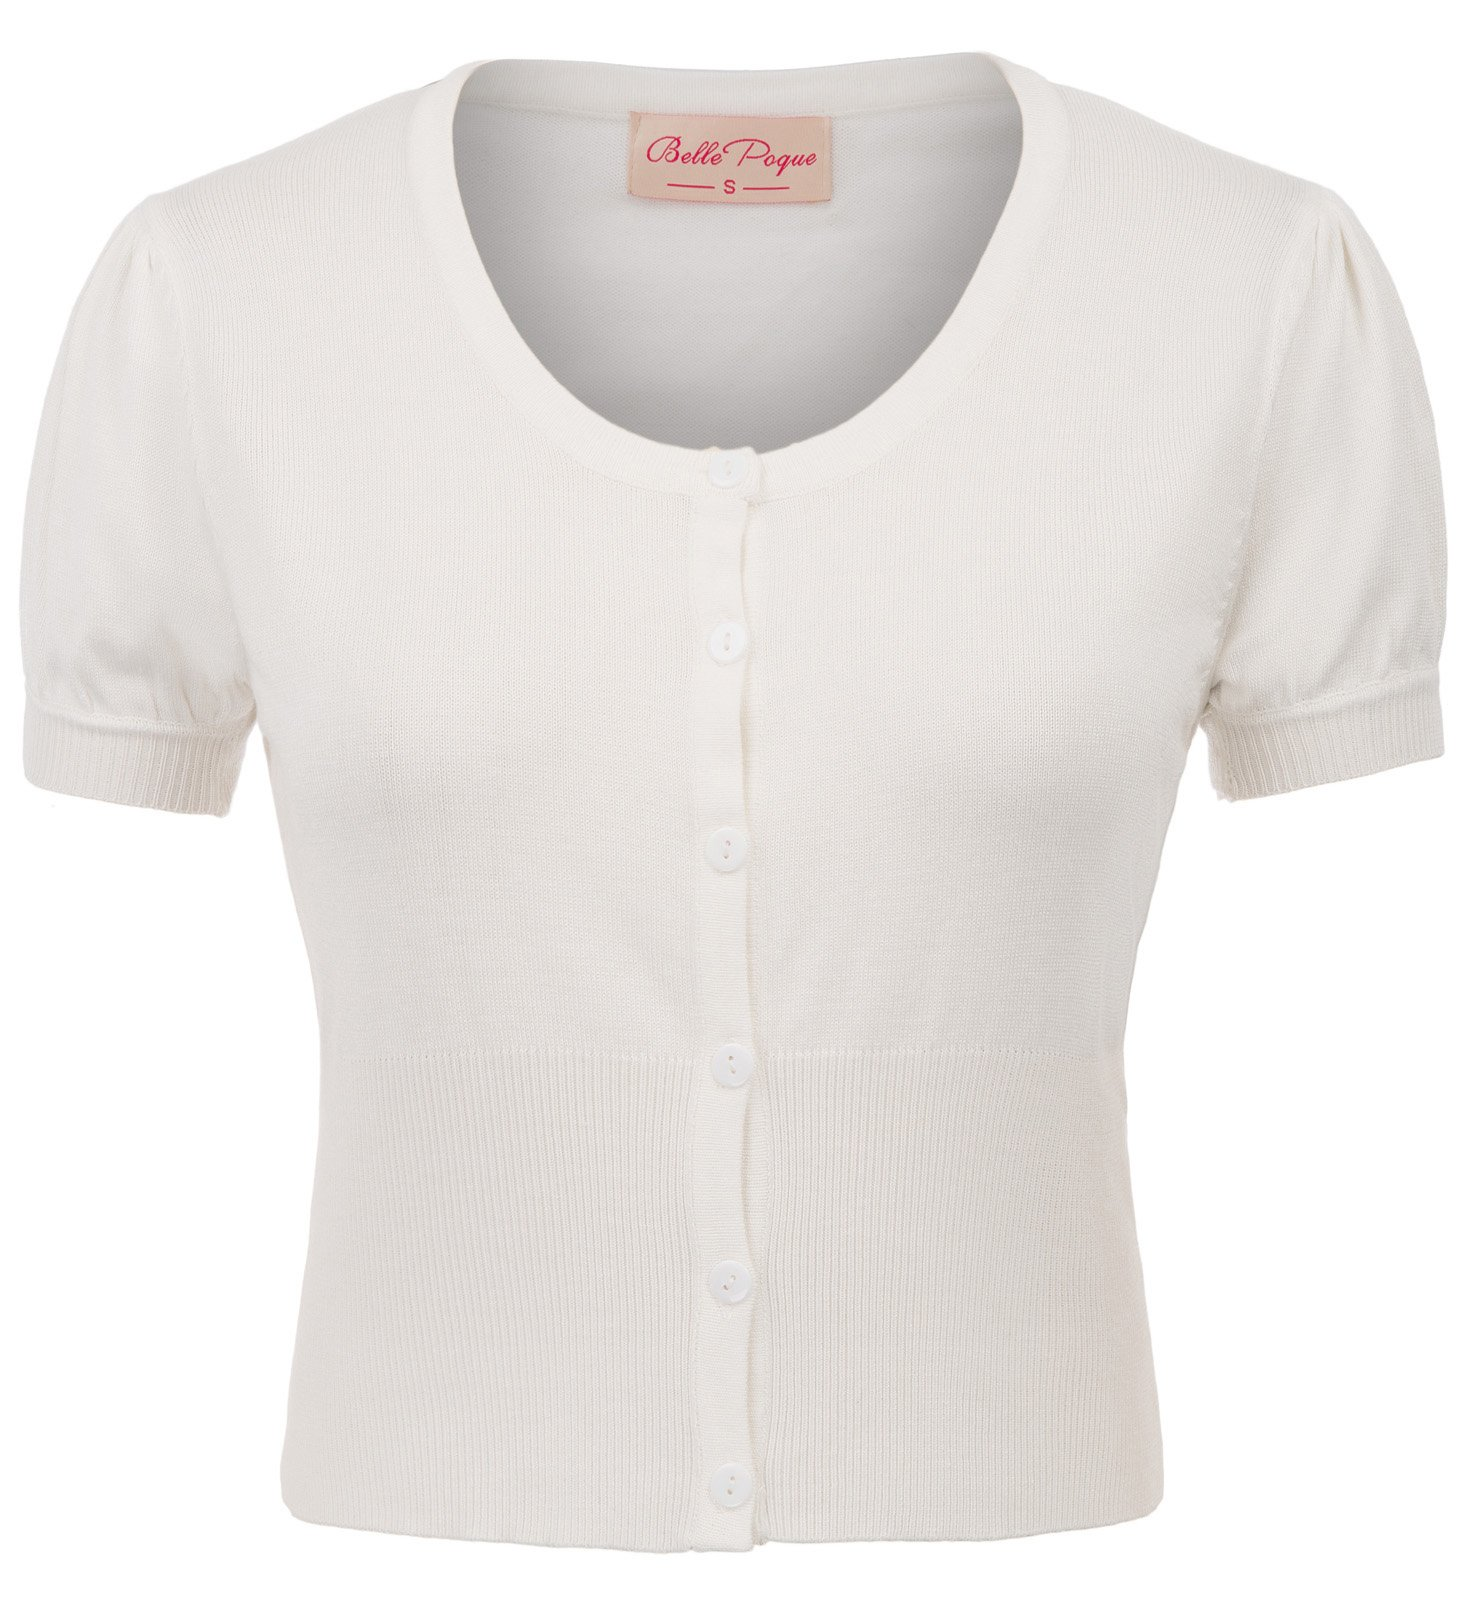 Womens Button Down Cardigan Short Sleeve Bolero Sweater M BP707-2